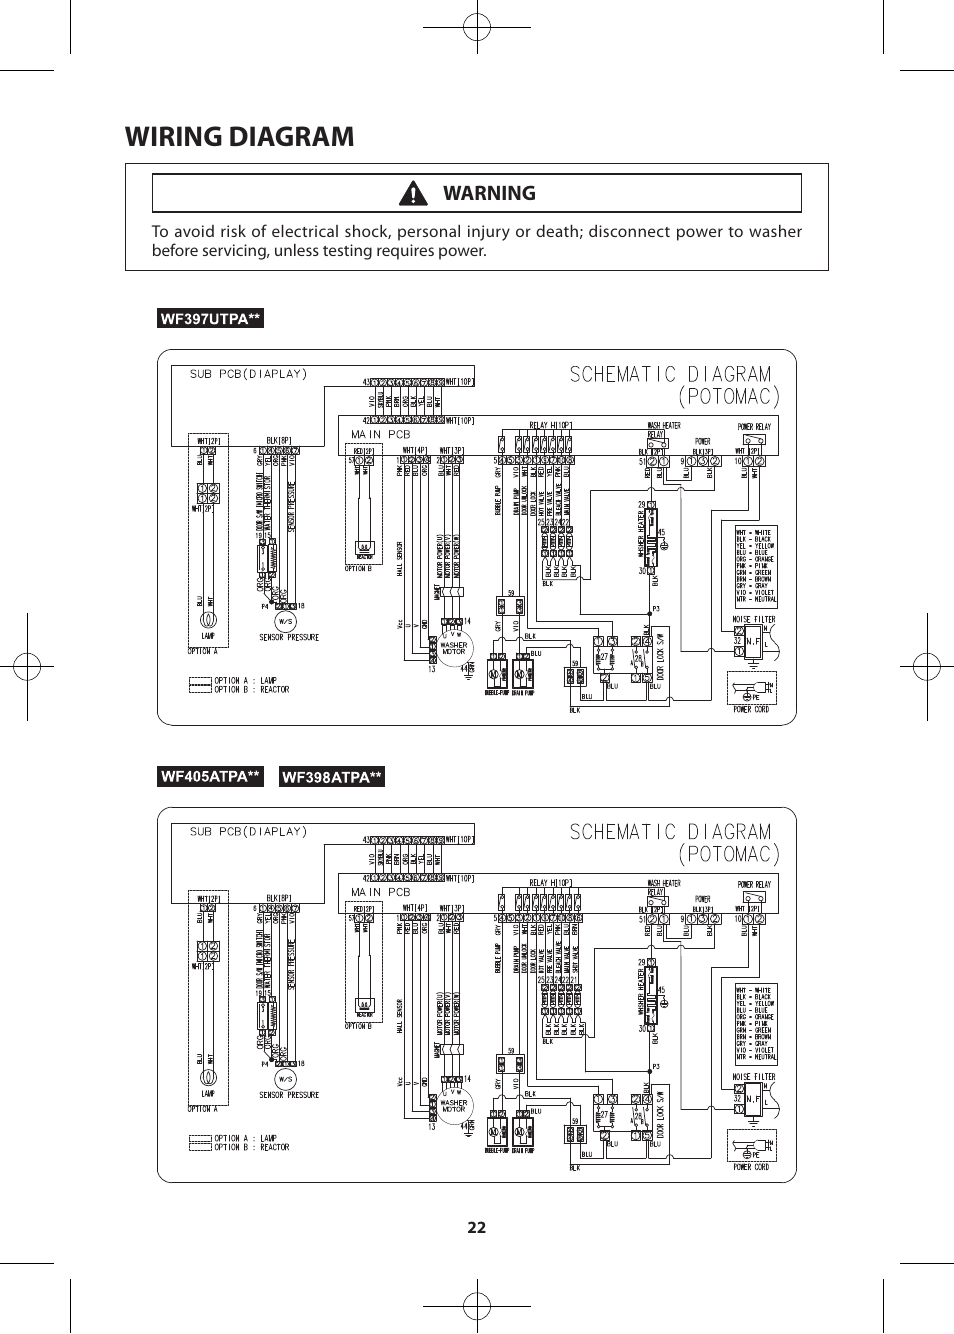 hight resolution of wiring diagram warning samsung wf405atpasu a2 user manual page 22 72